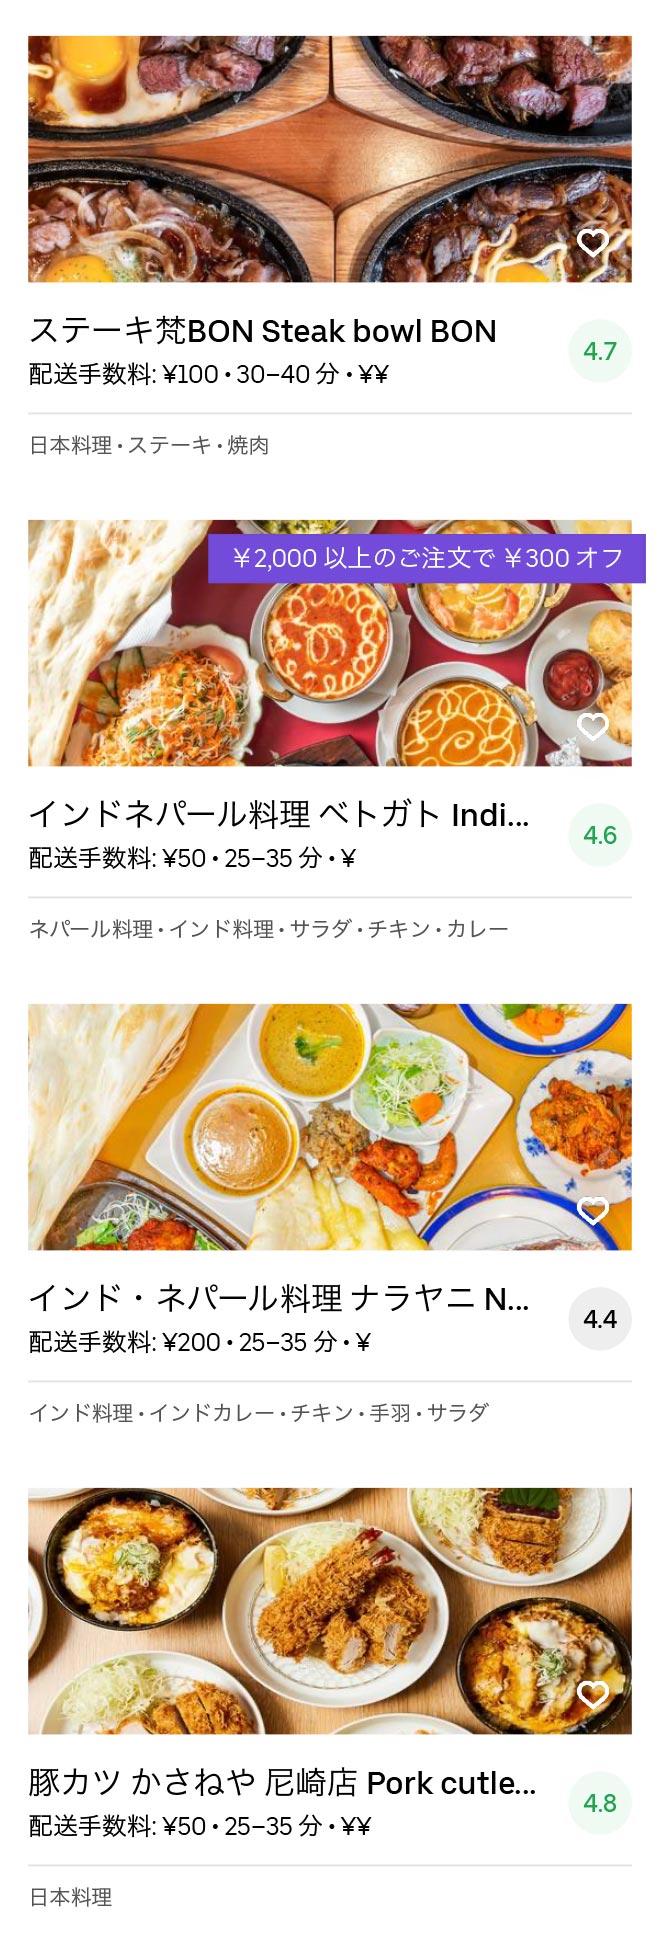 Amagasaki menu 2005 08